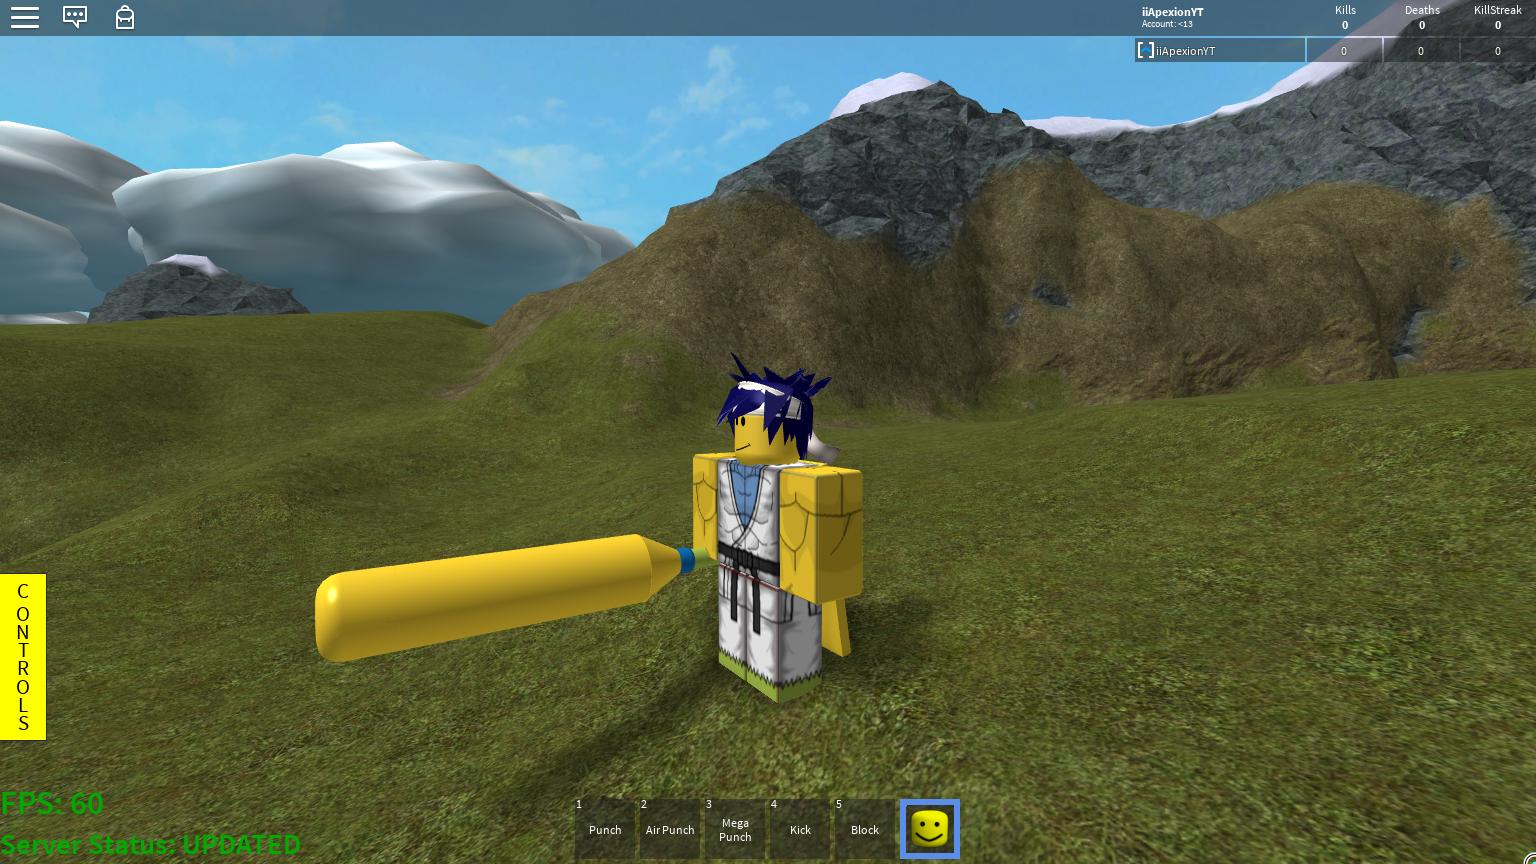 Baseball Bat Roblox Ragdoll System Test Wiki Fandom - www roblox login com landing animated